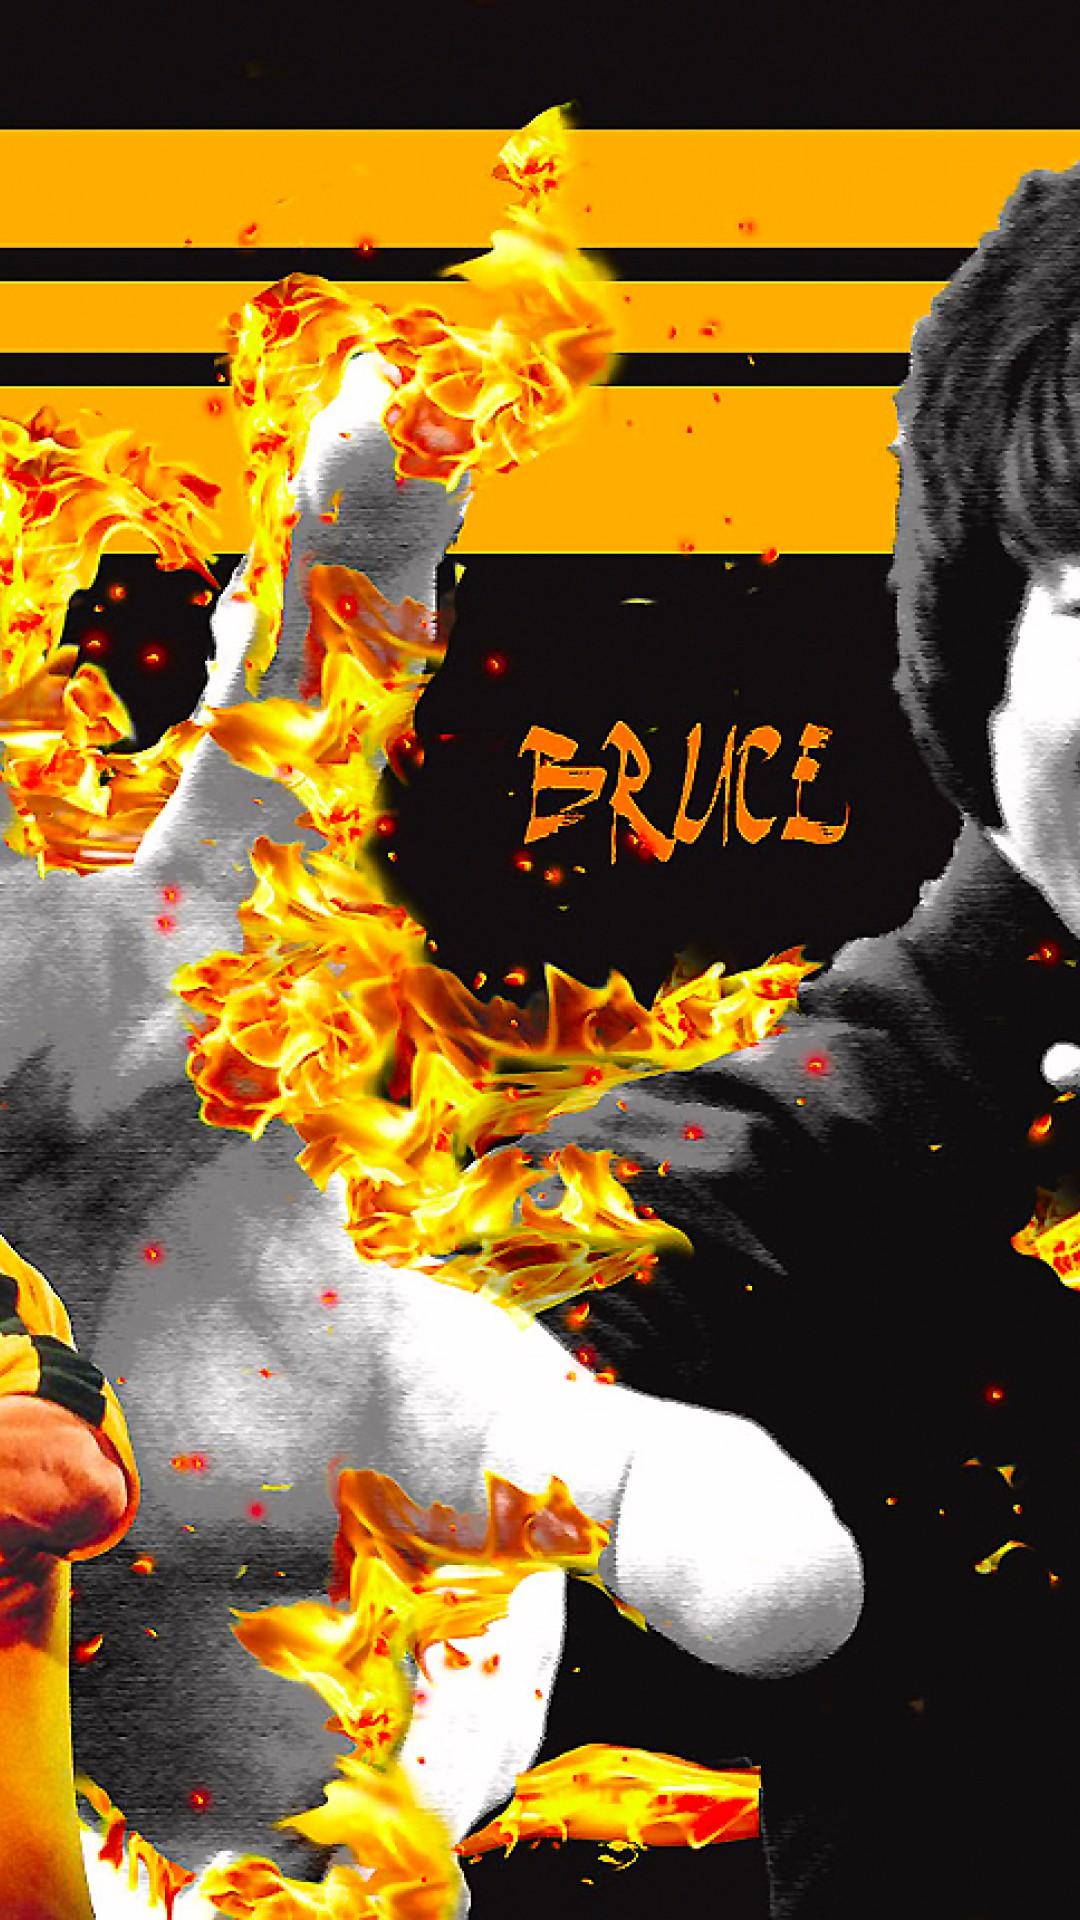 Bruce Lee Hd Wallpaper Iphone 6 6s Plus Hd Wallpaper